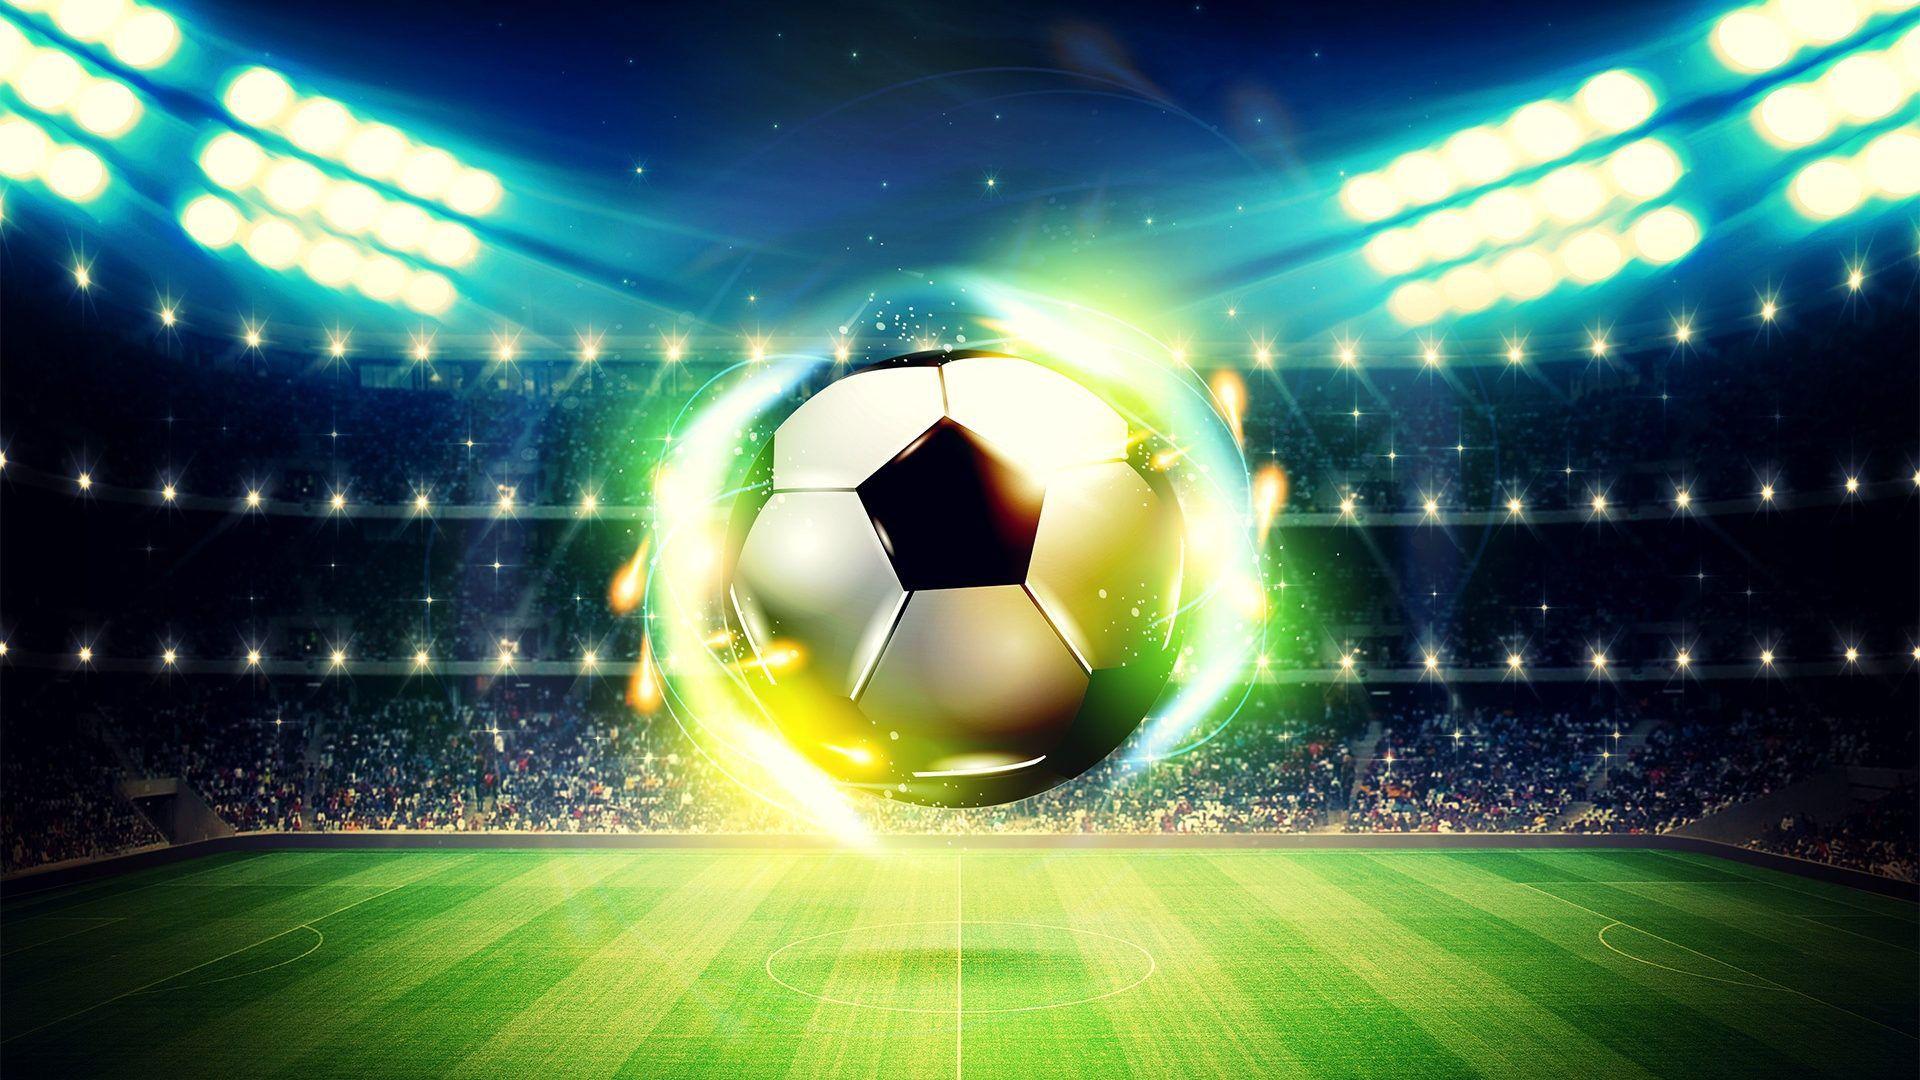 STUNNING ATTRACTIVE FOOTBALL 17 HD DESKTOP BACKGROUND